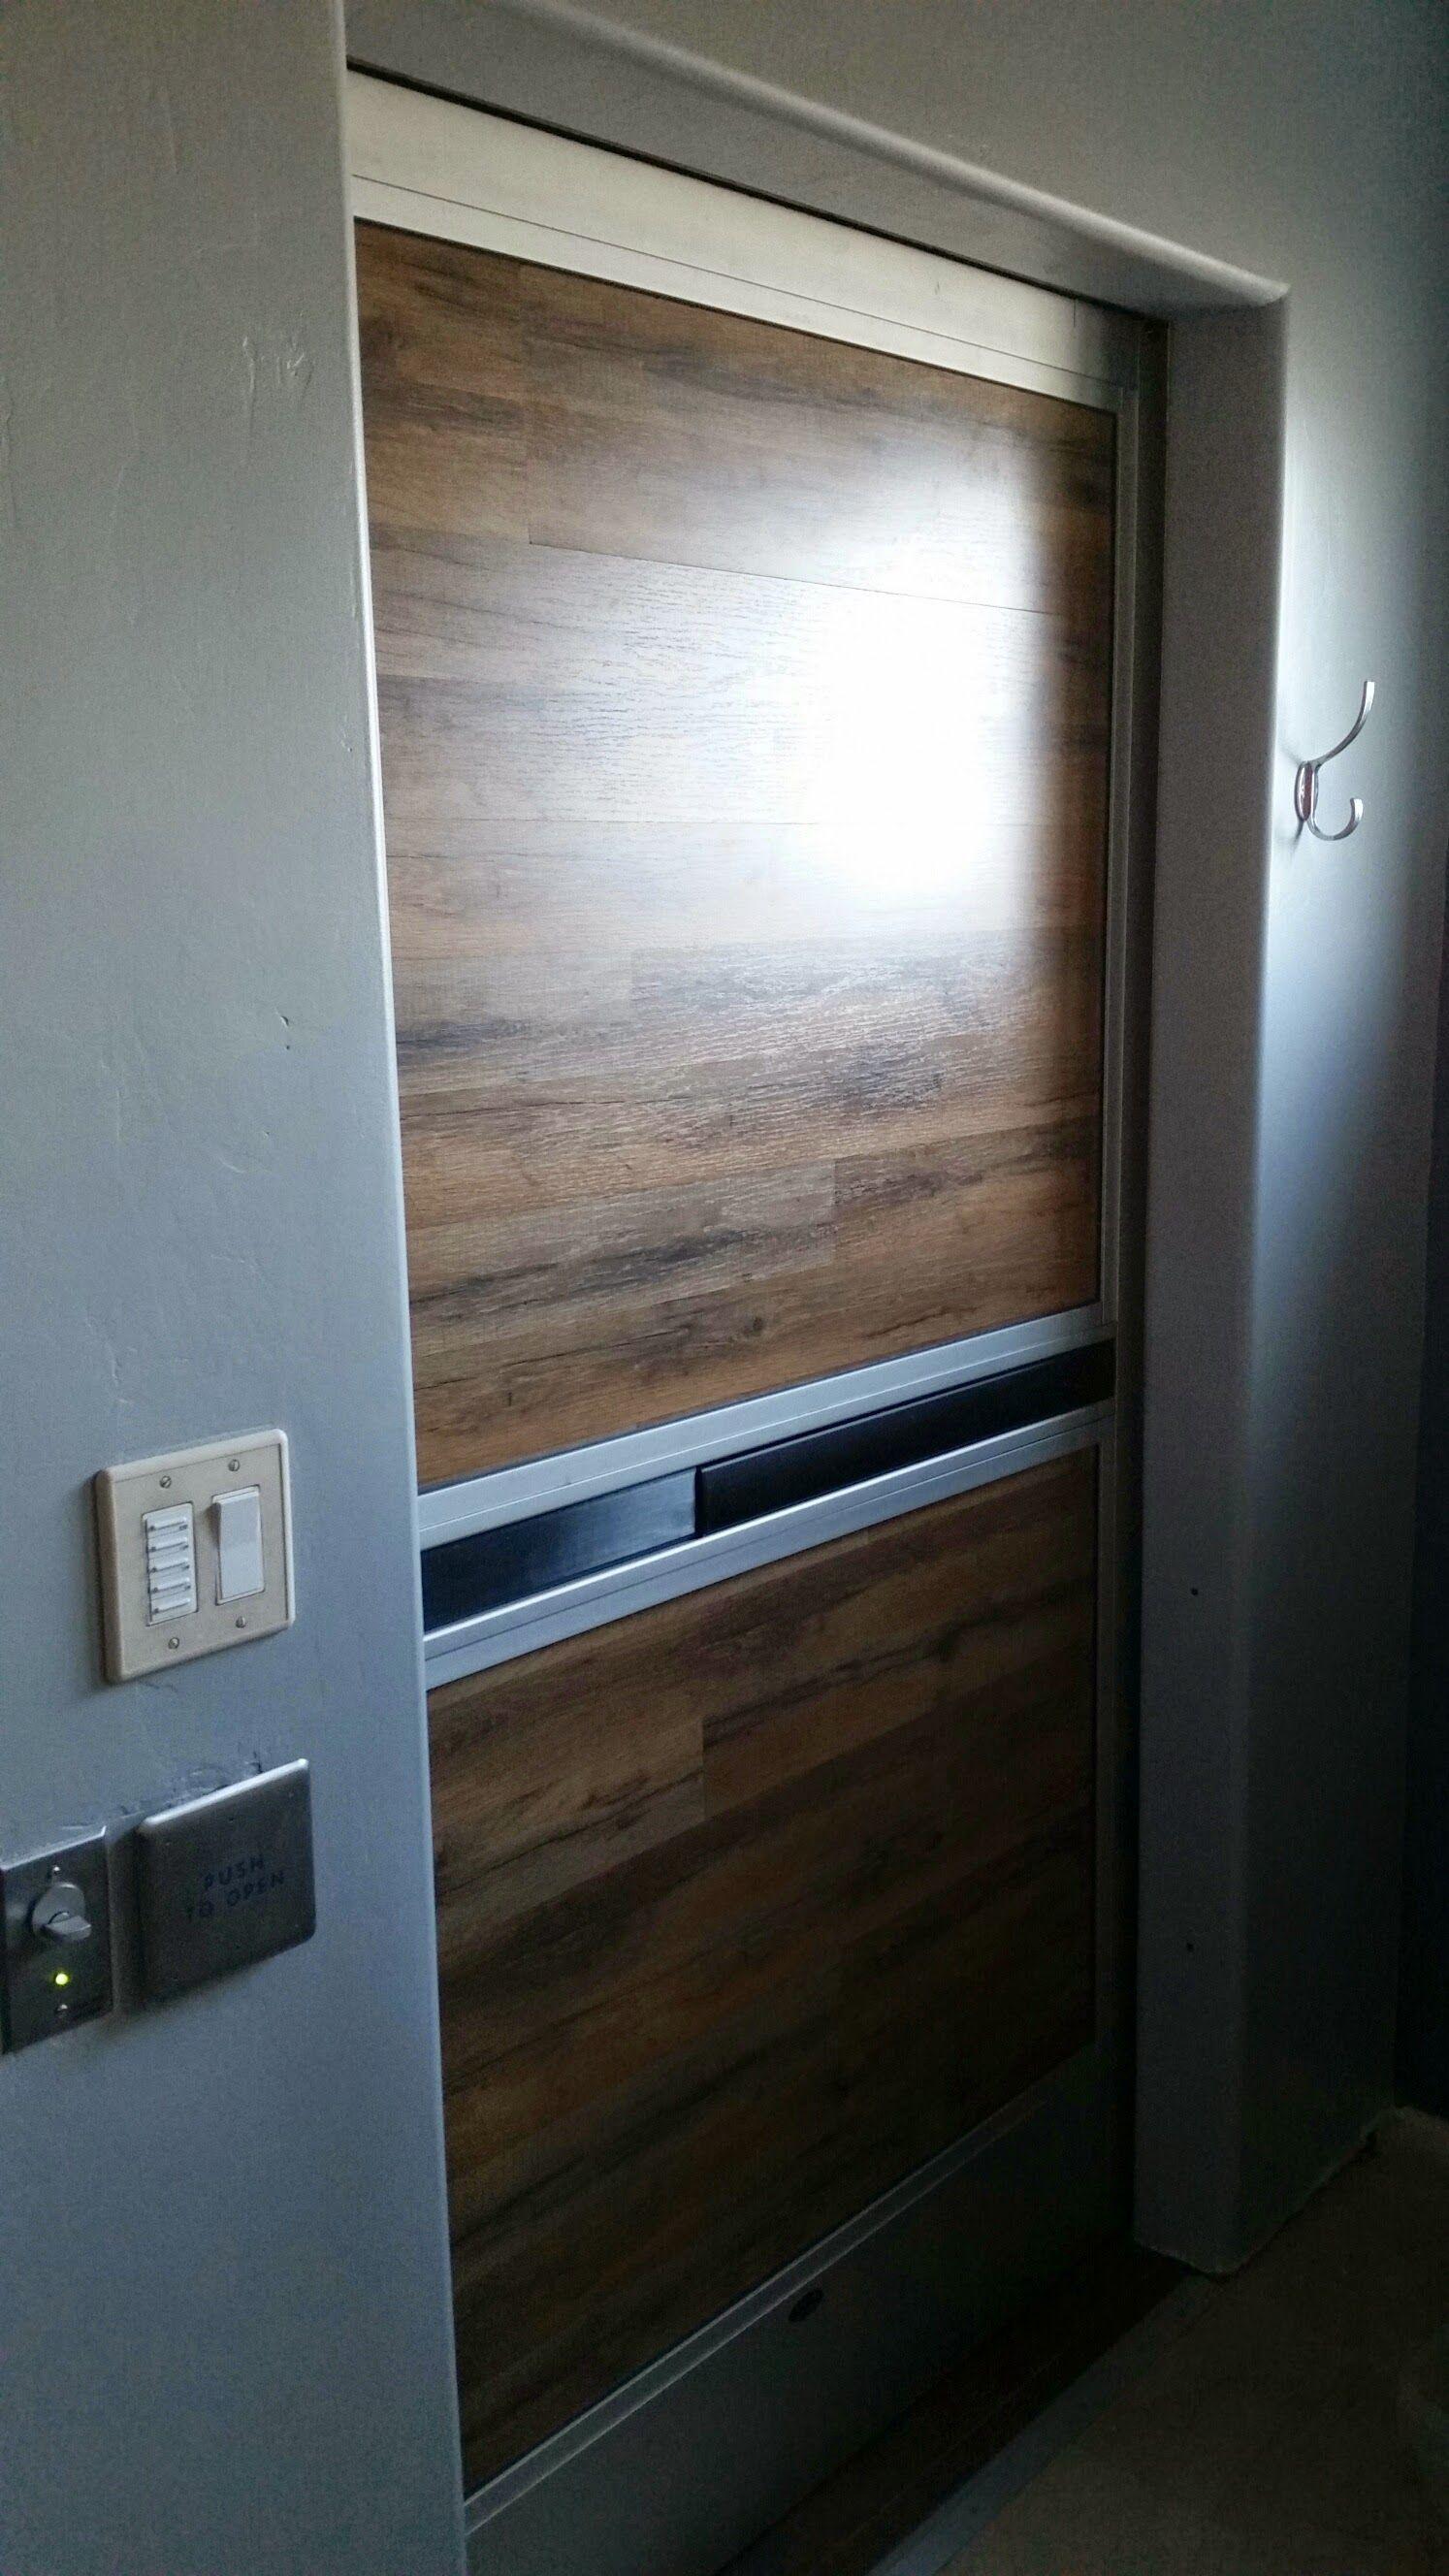 Hidden bathroom door - Besam Sl500 Automatic Sliding Door Bathroom Slider The Thumbturn On The Inside Turns